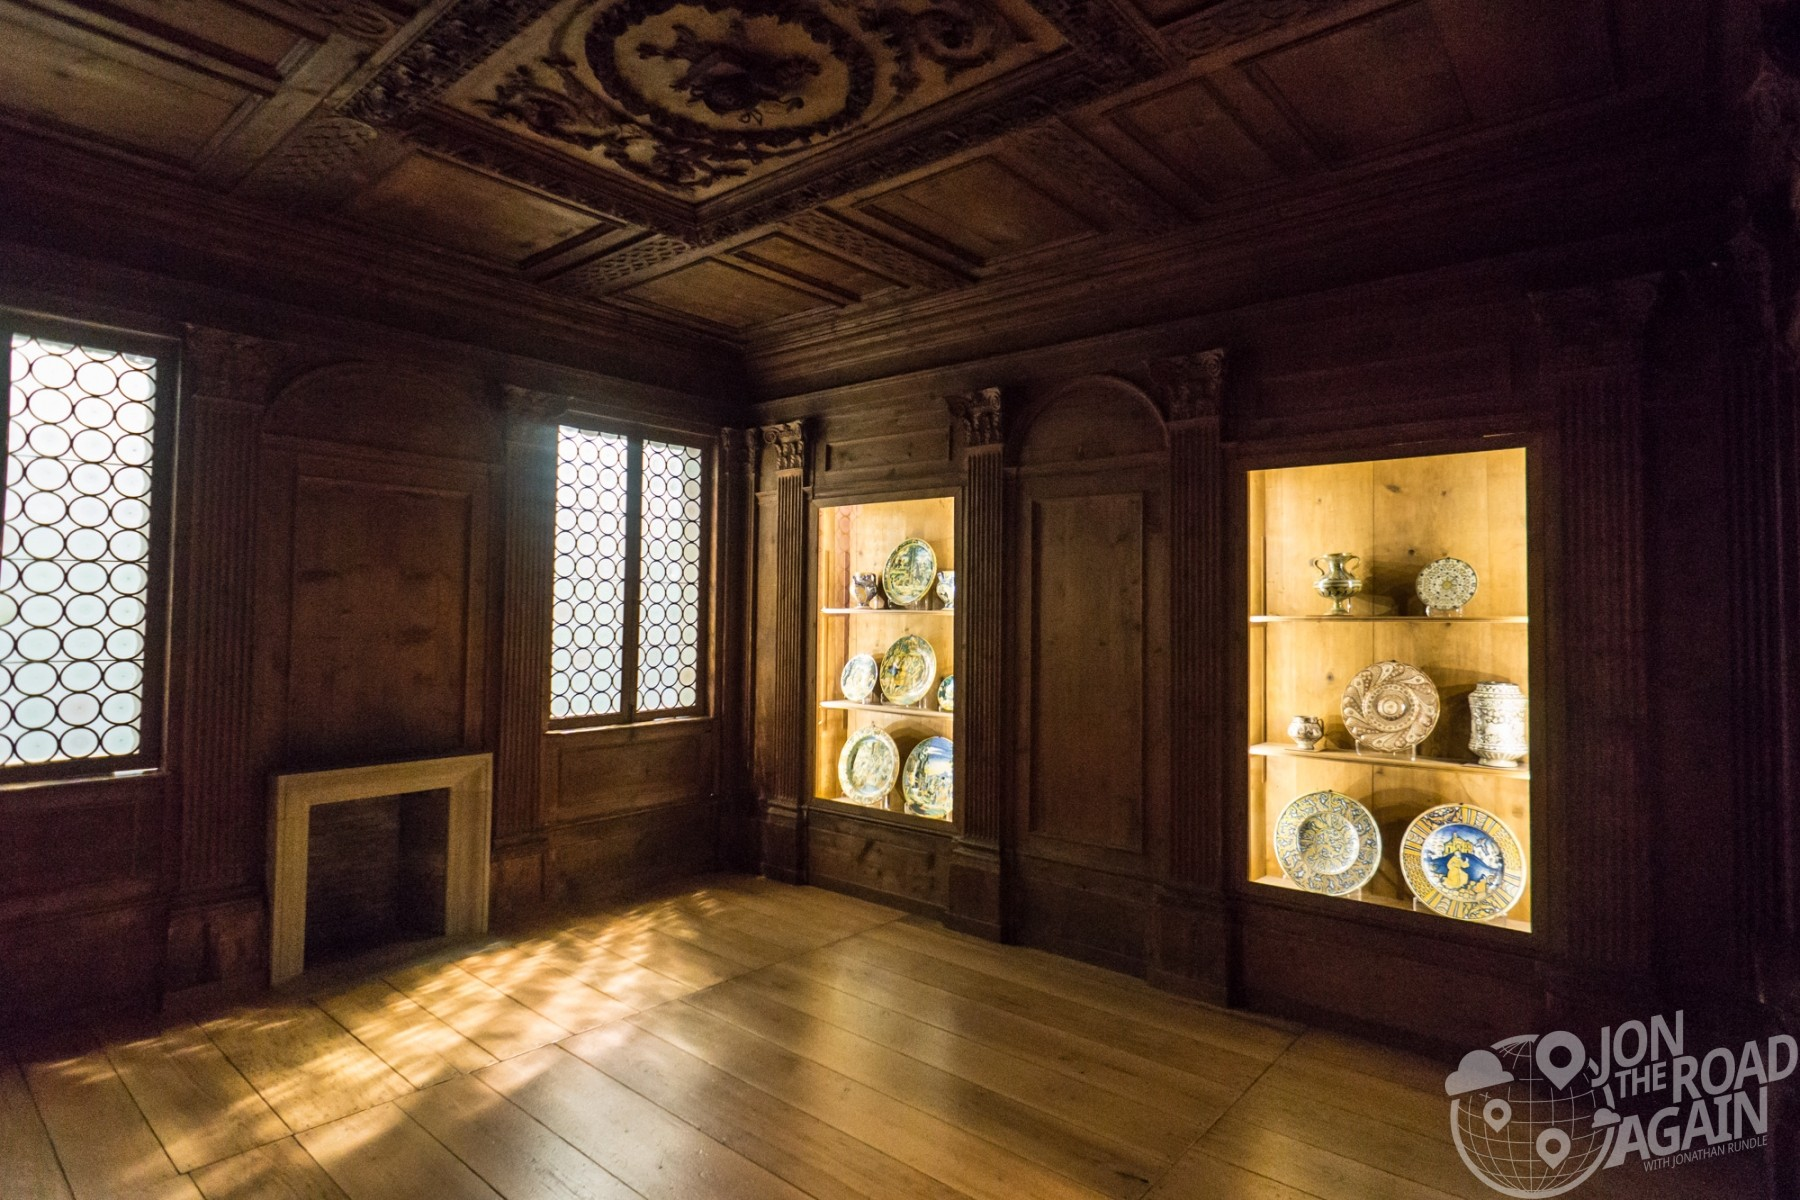 Seattle art museum Italian room